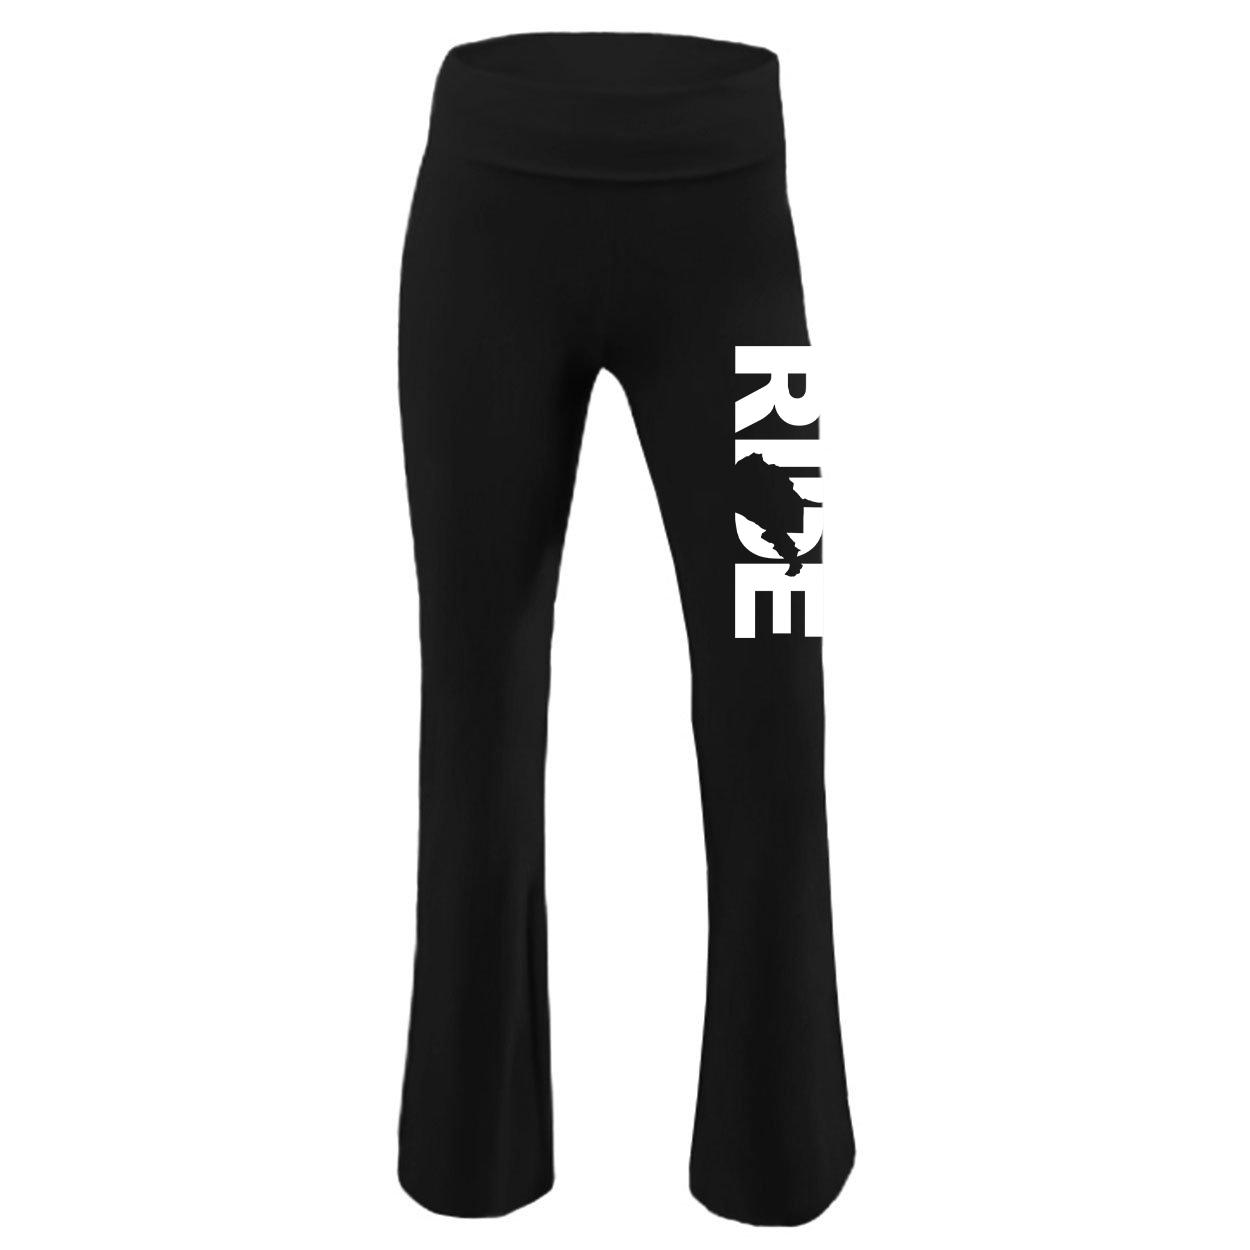 Ride West Virginia Classic Youth Girls Yoga Pants Black (White Logo)